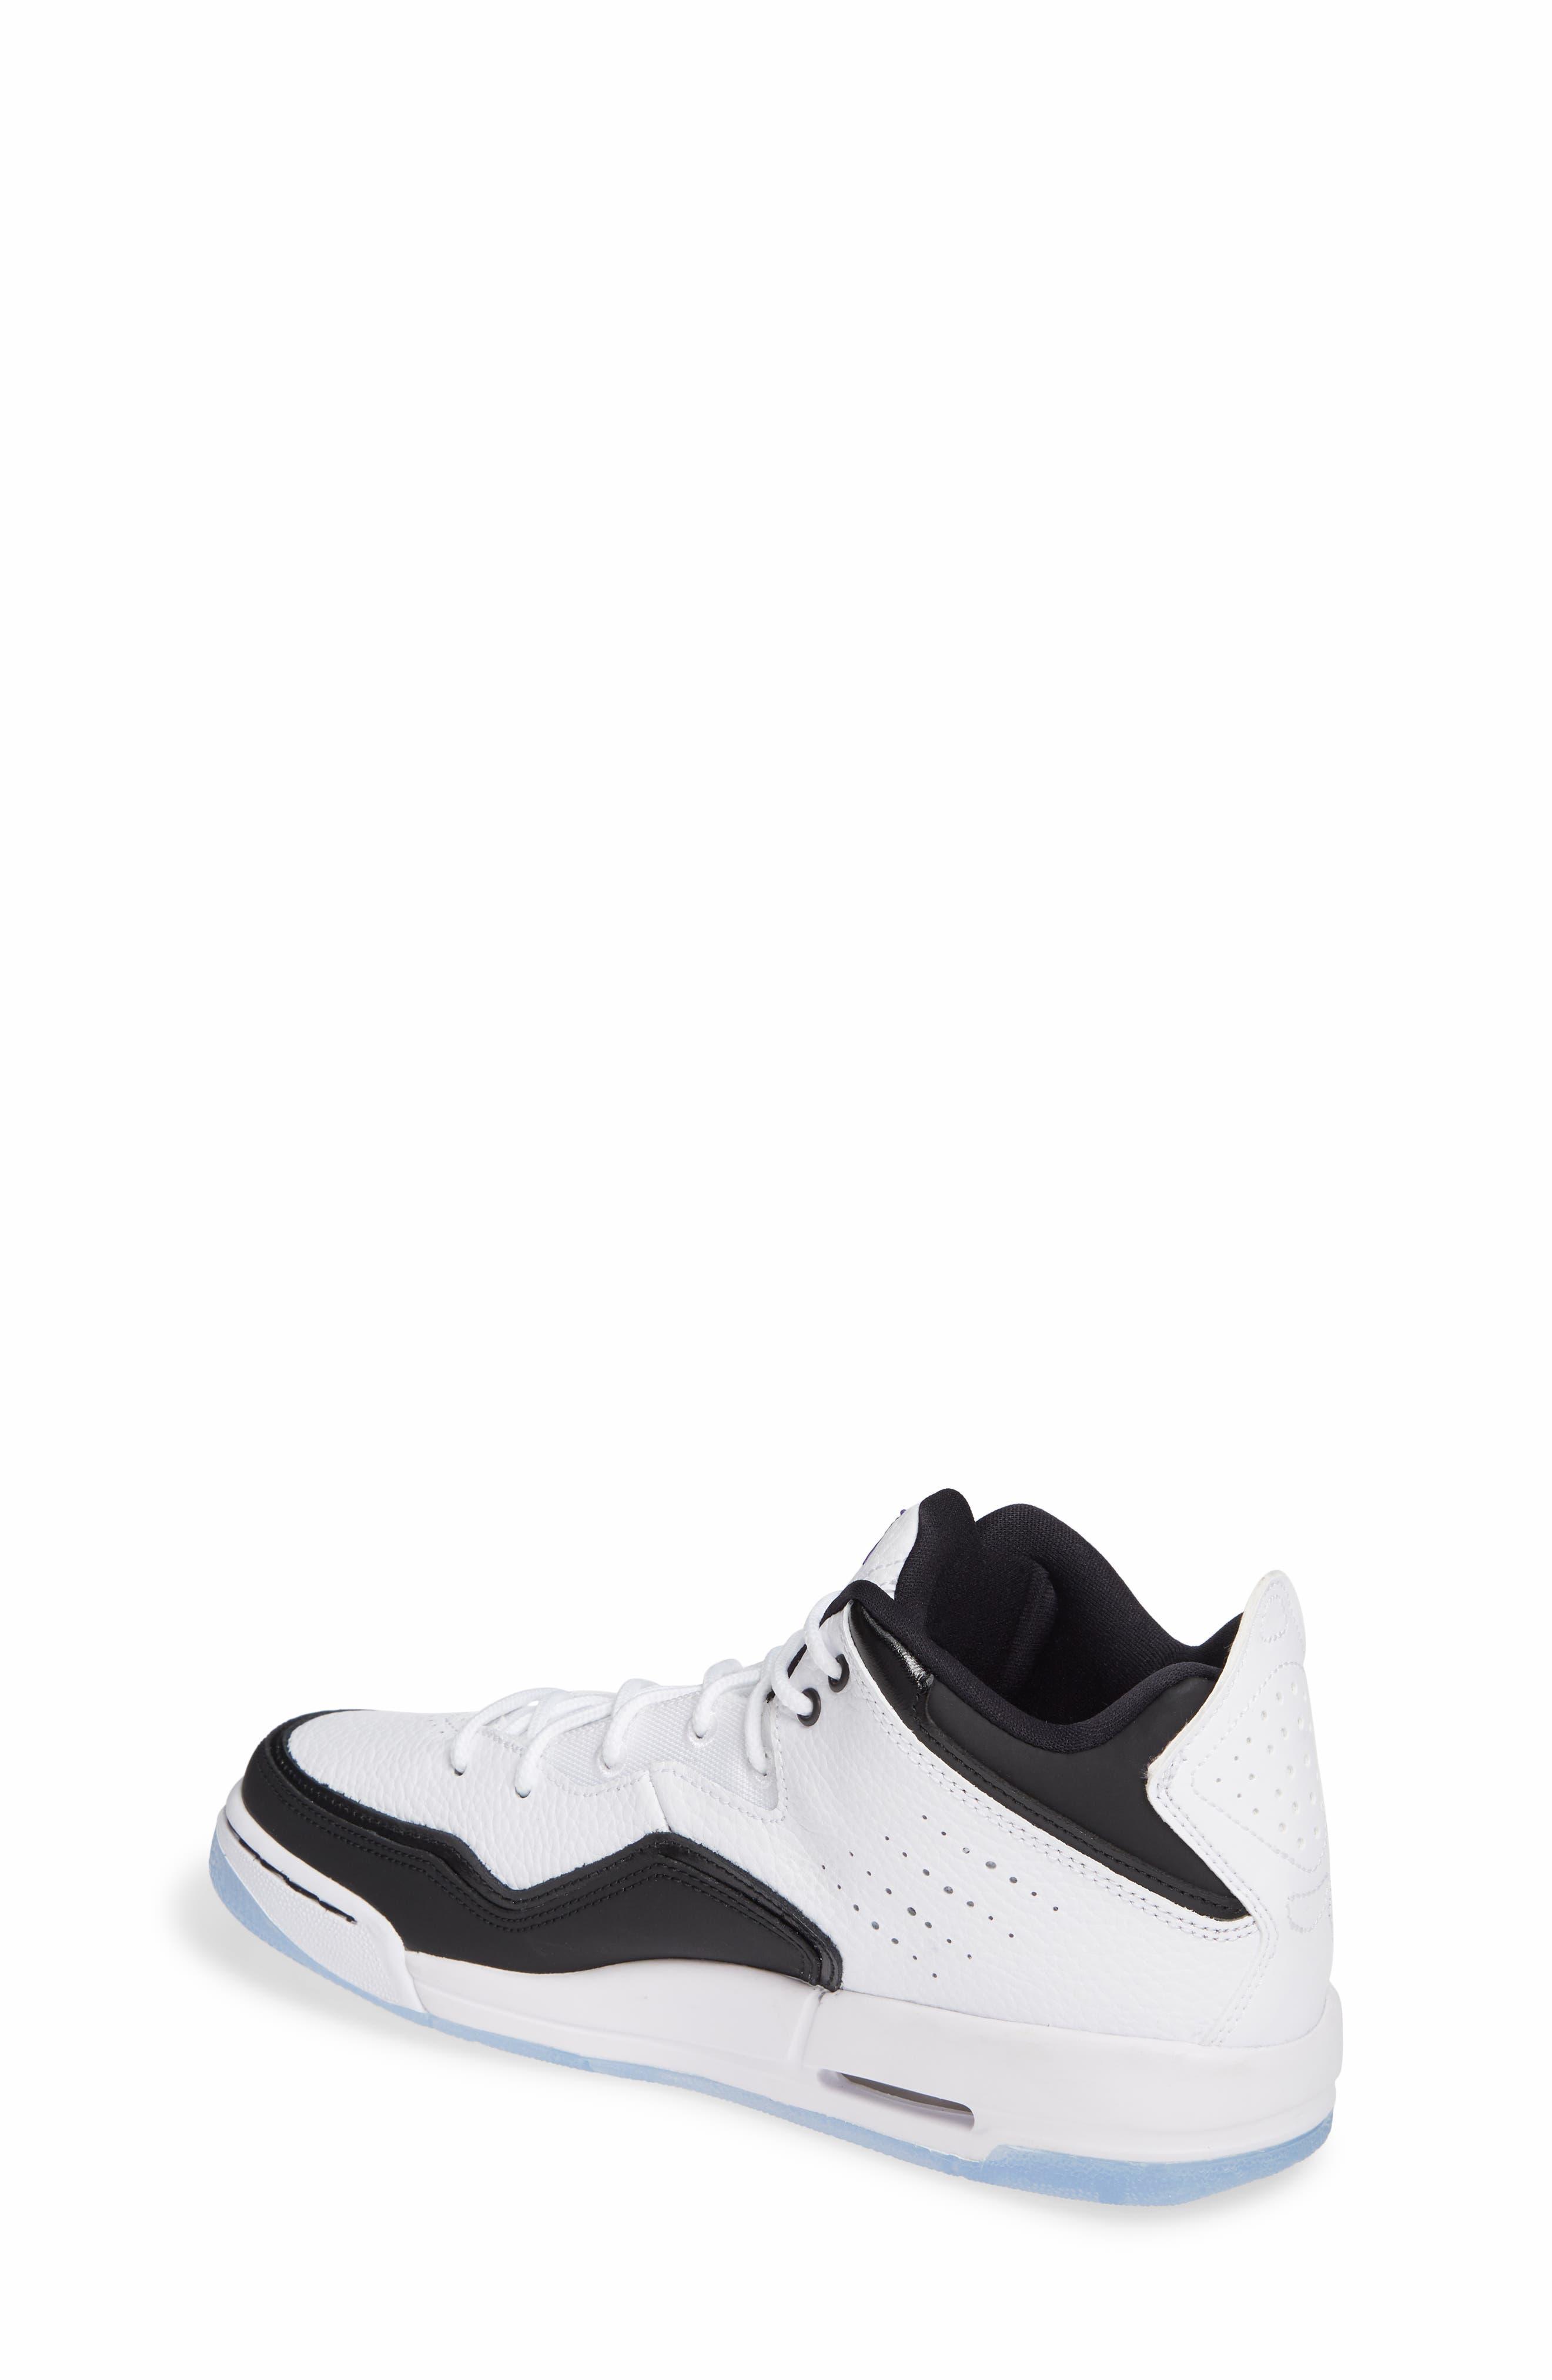 JORDAN, Nike Air Jordan Courtside 23 Sneaker, Alternate thumbnail 2, color, WHITE/ CONCORD BLACK